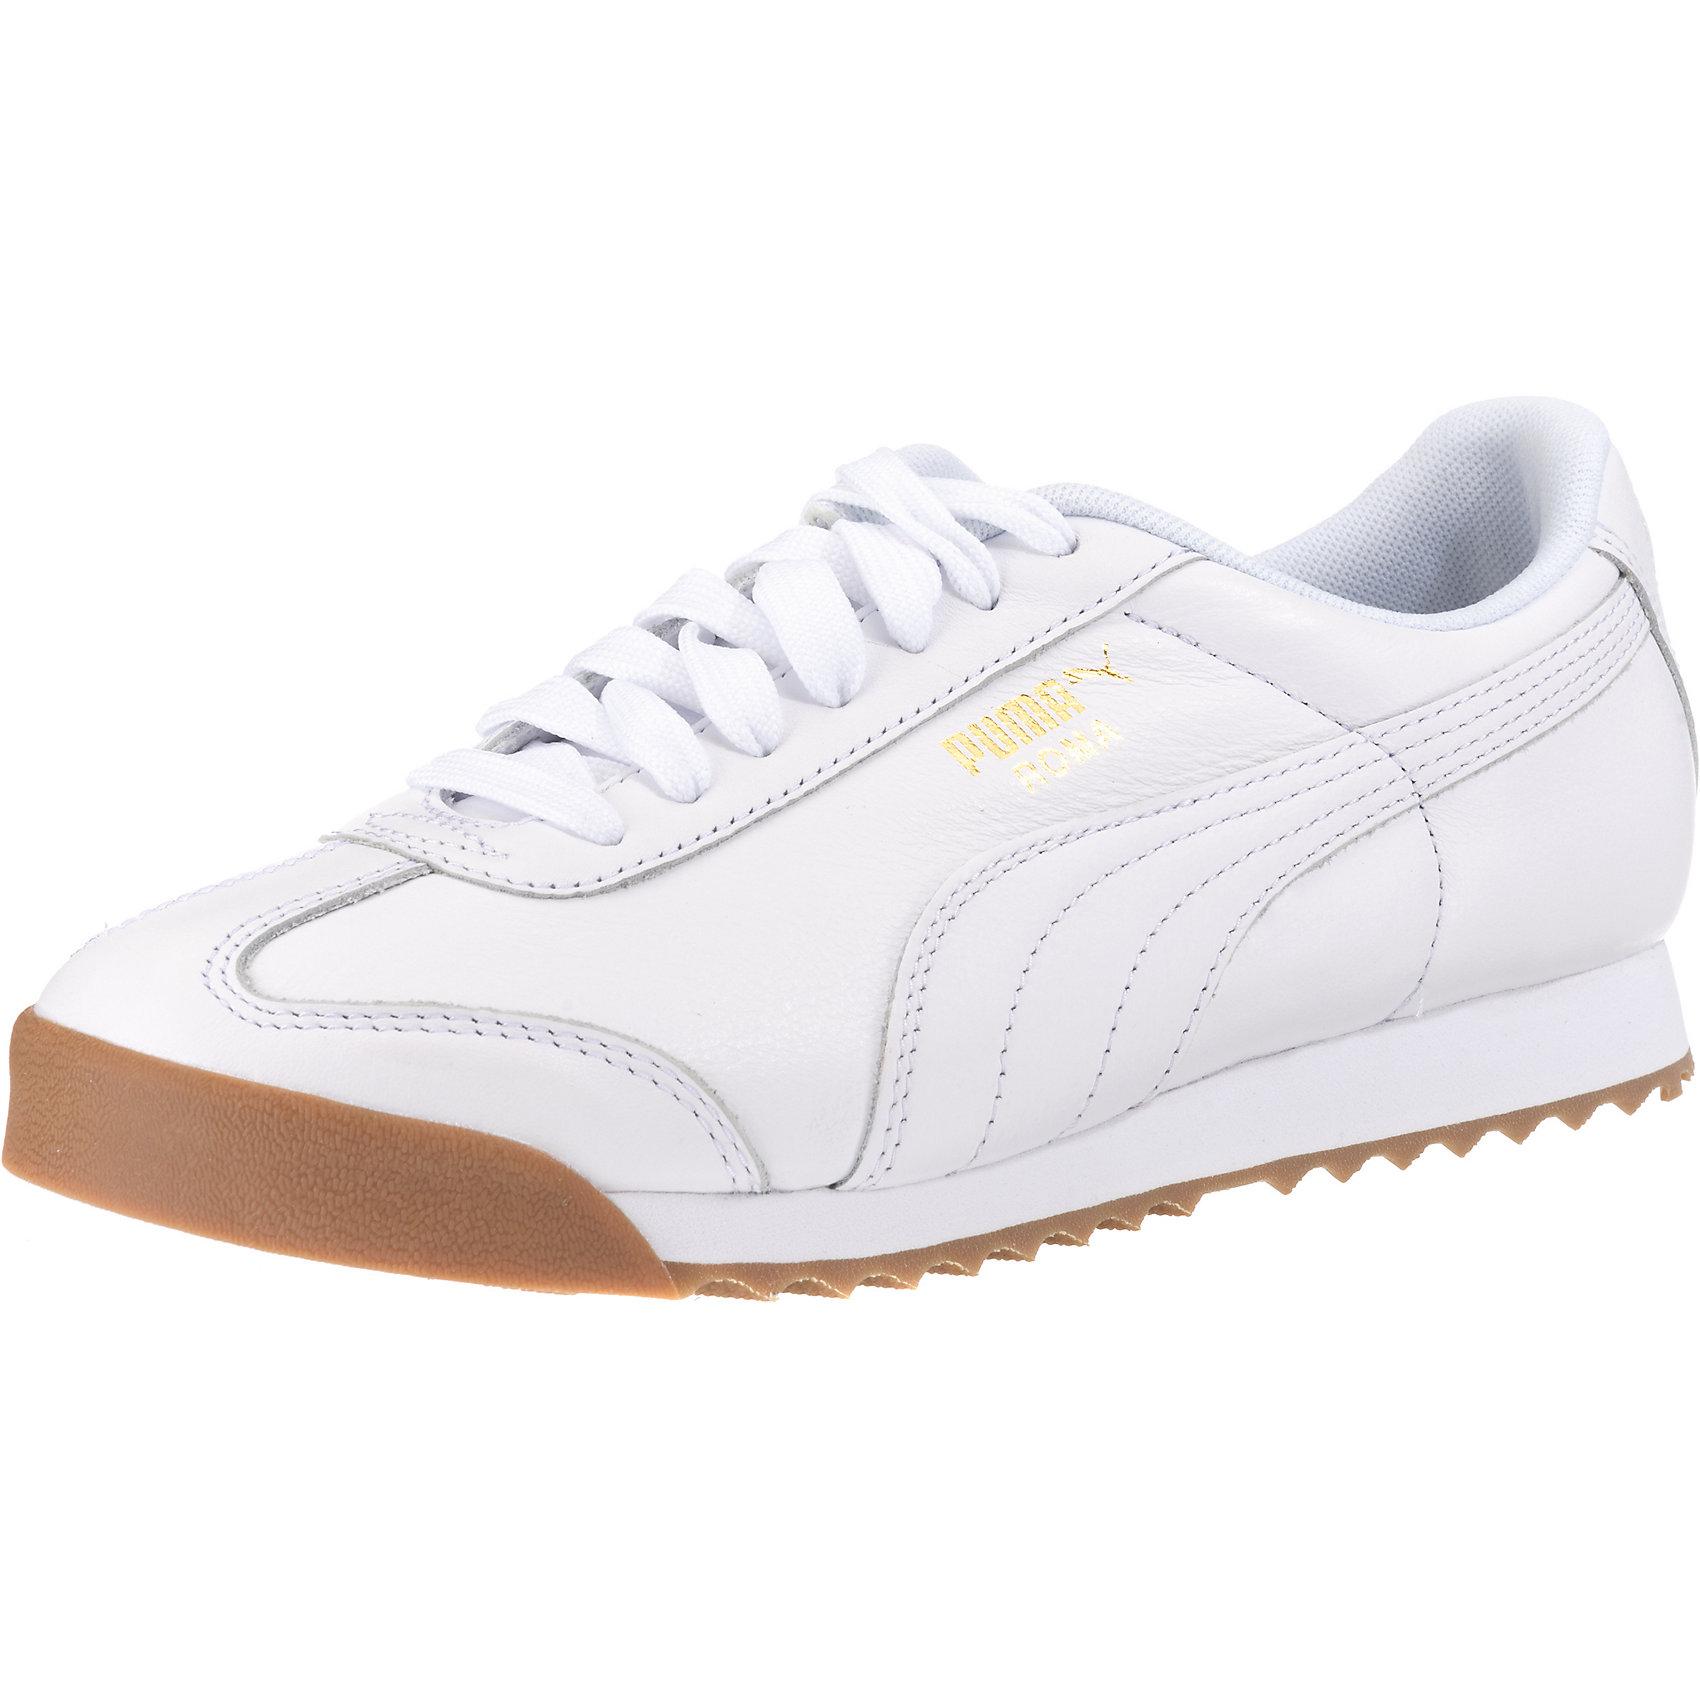 quality design 3d814 eaf73 ... Nike Jordan Trainer ST Men s sneakers sneakers sneakers 820253 010  multiple sizes ba4427 ...